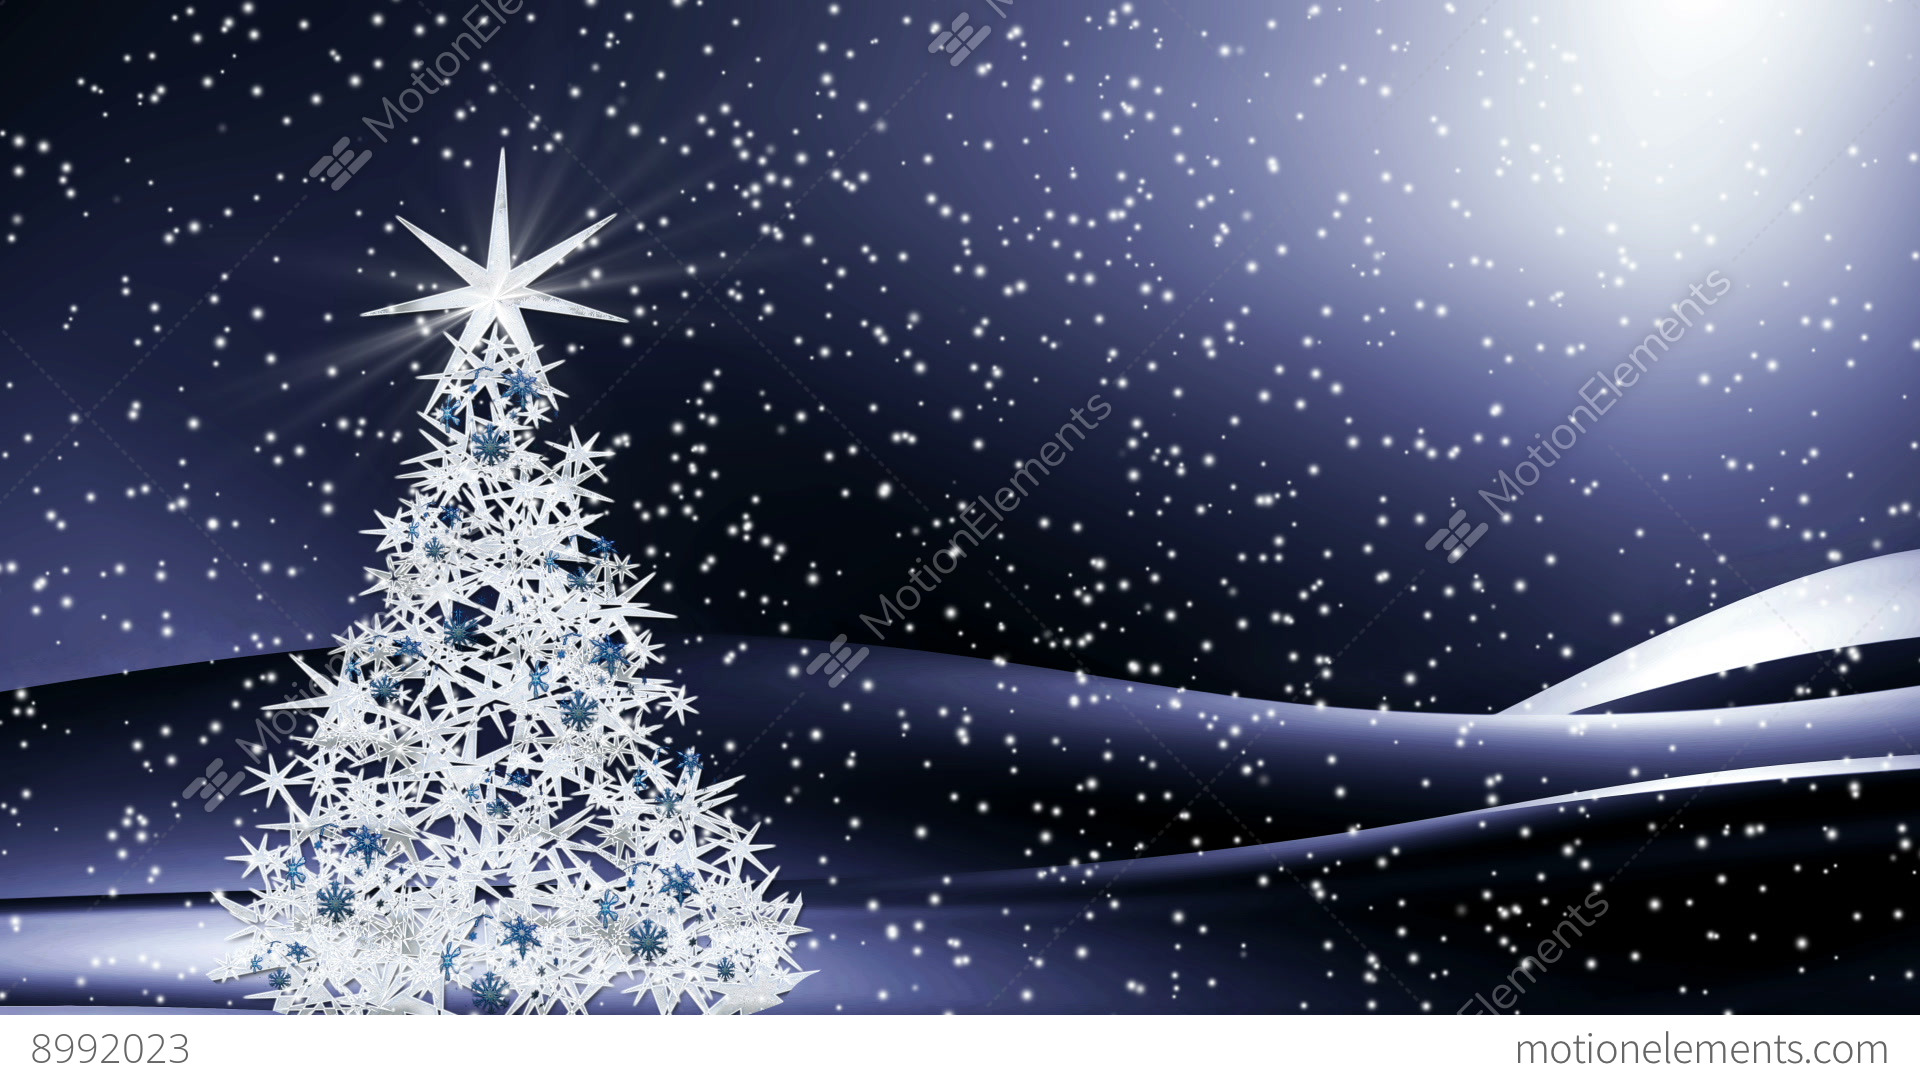 Snowy Night Christmas Decorations